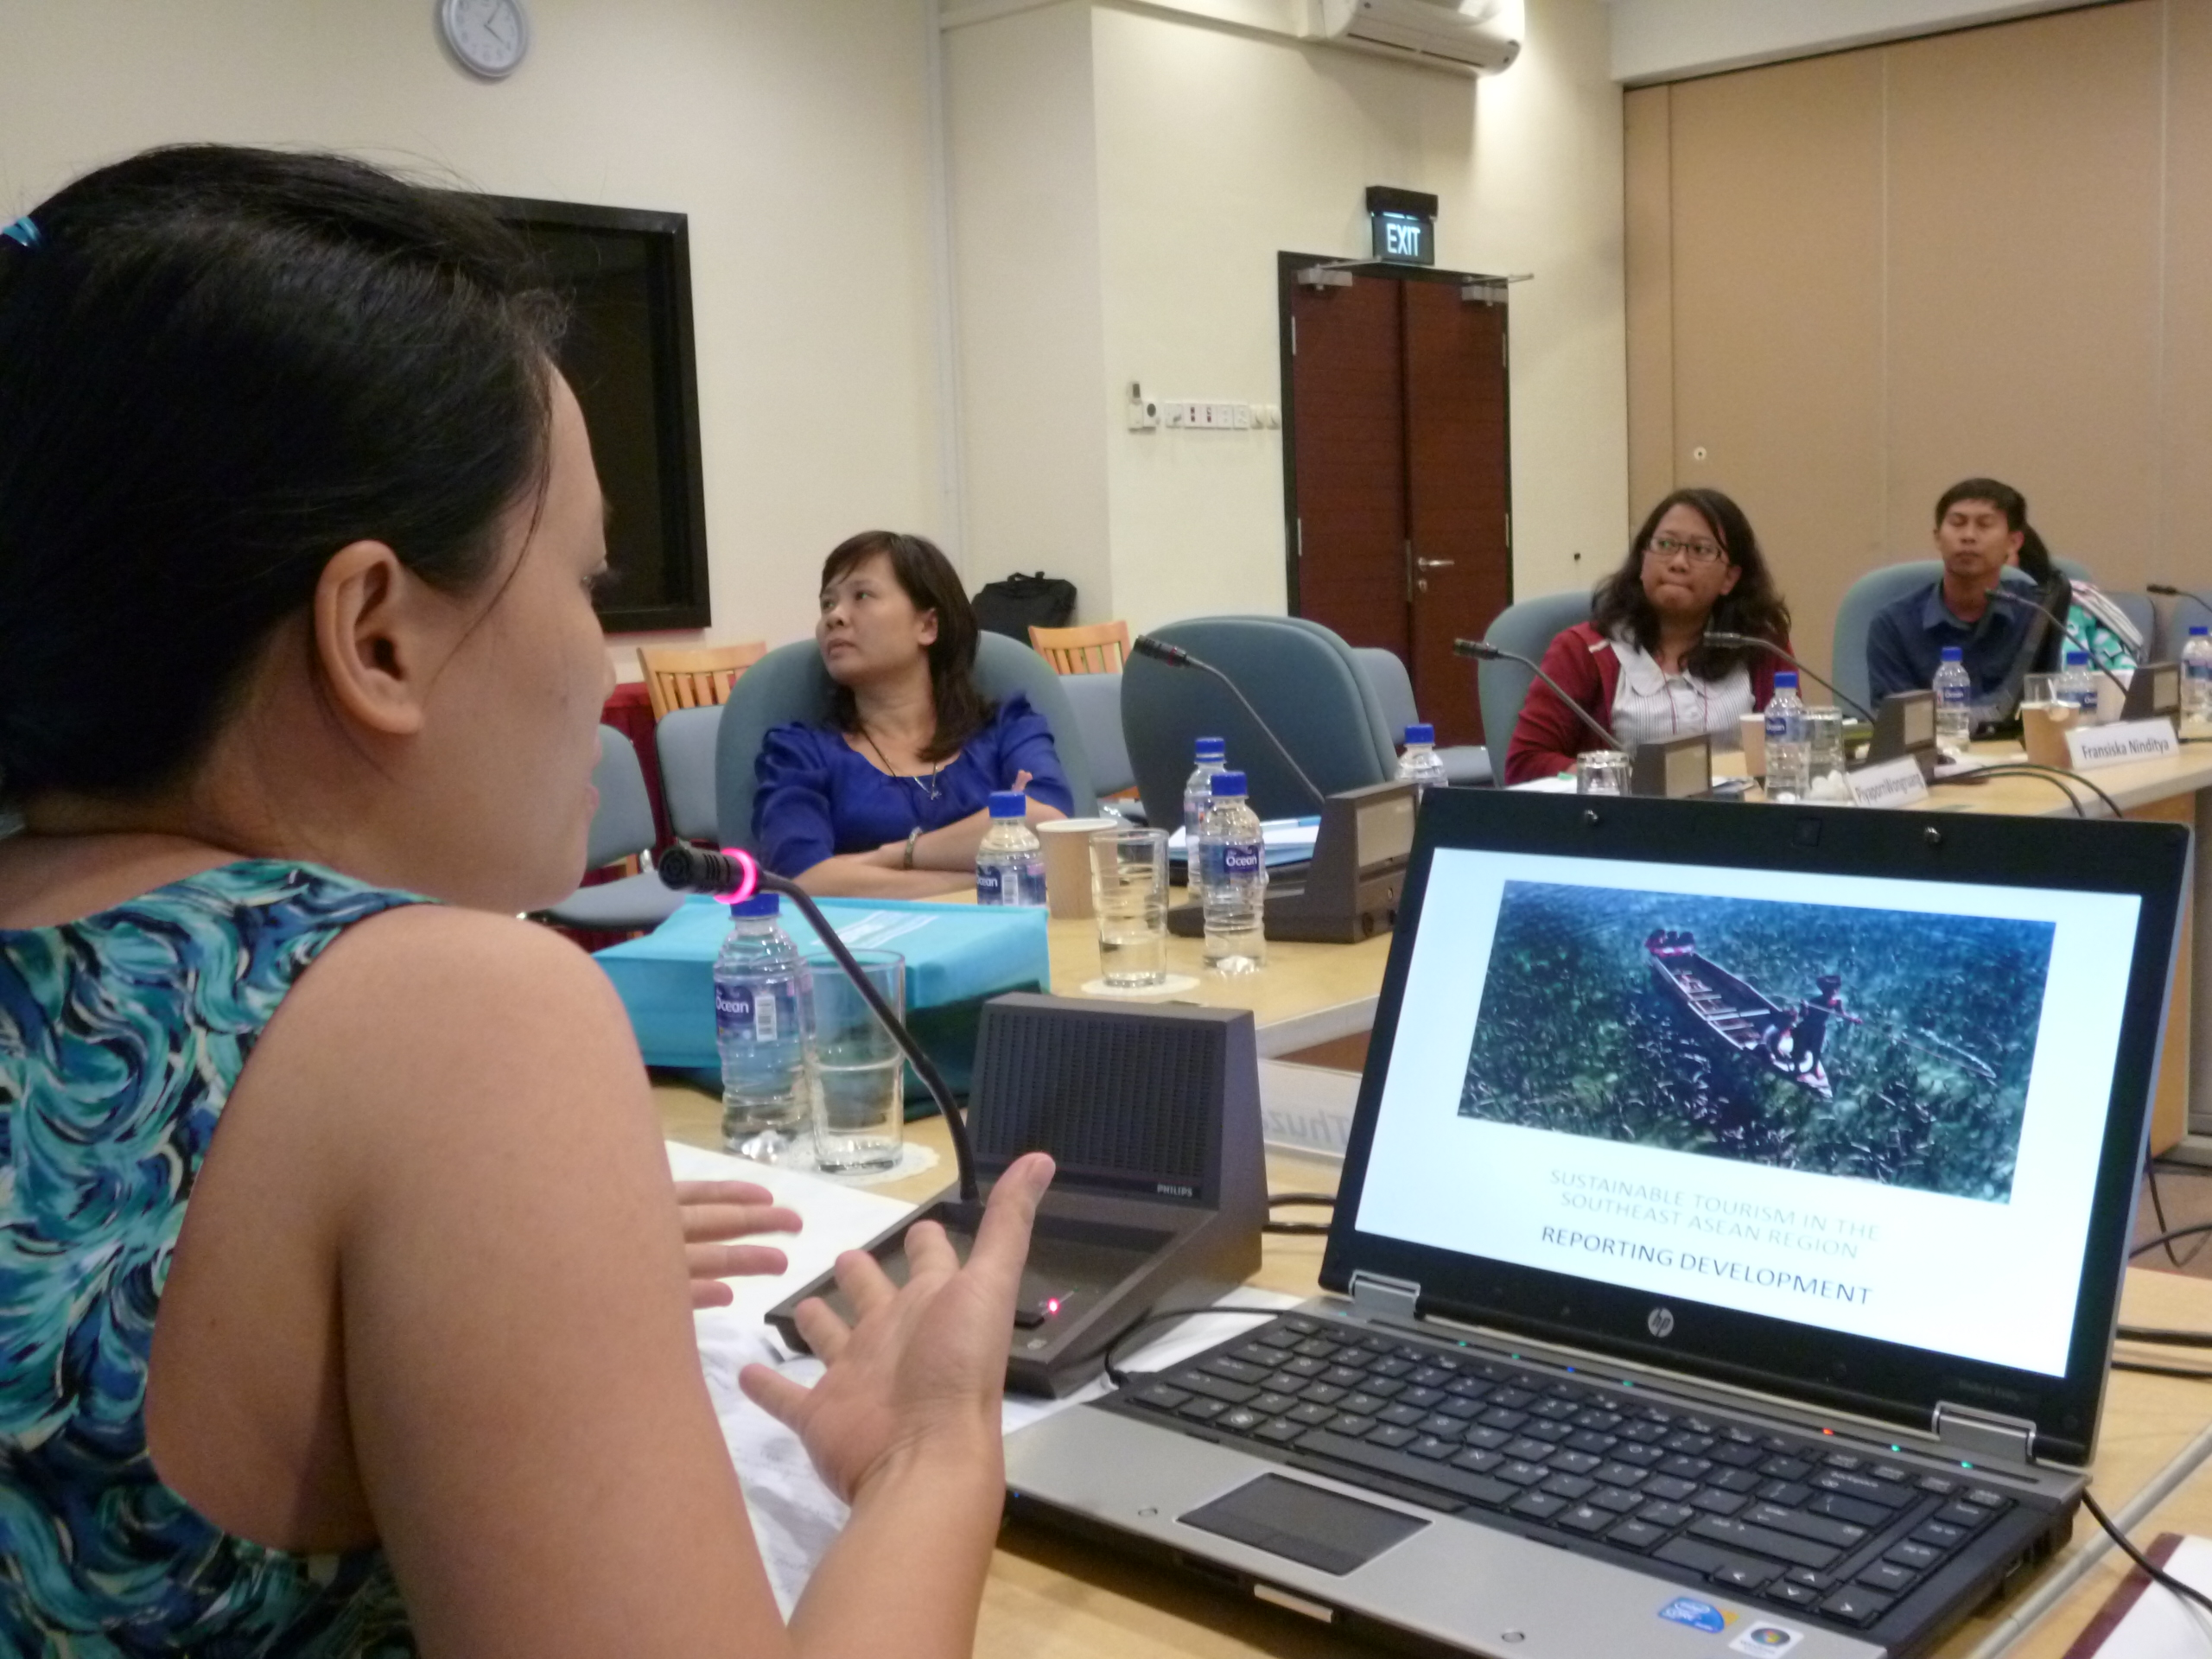 ASEAN urged to improve skills levels